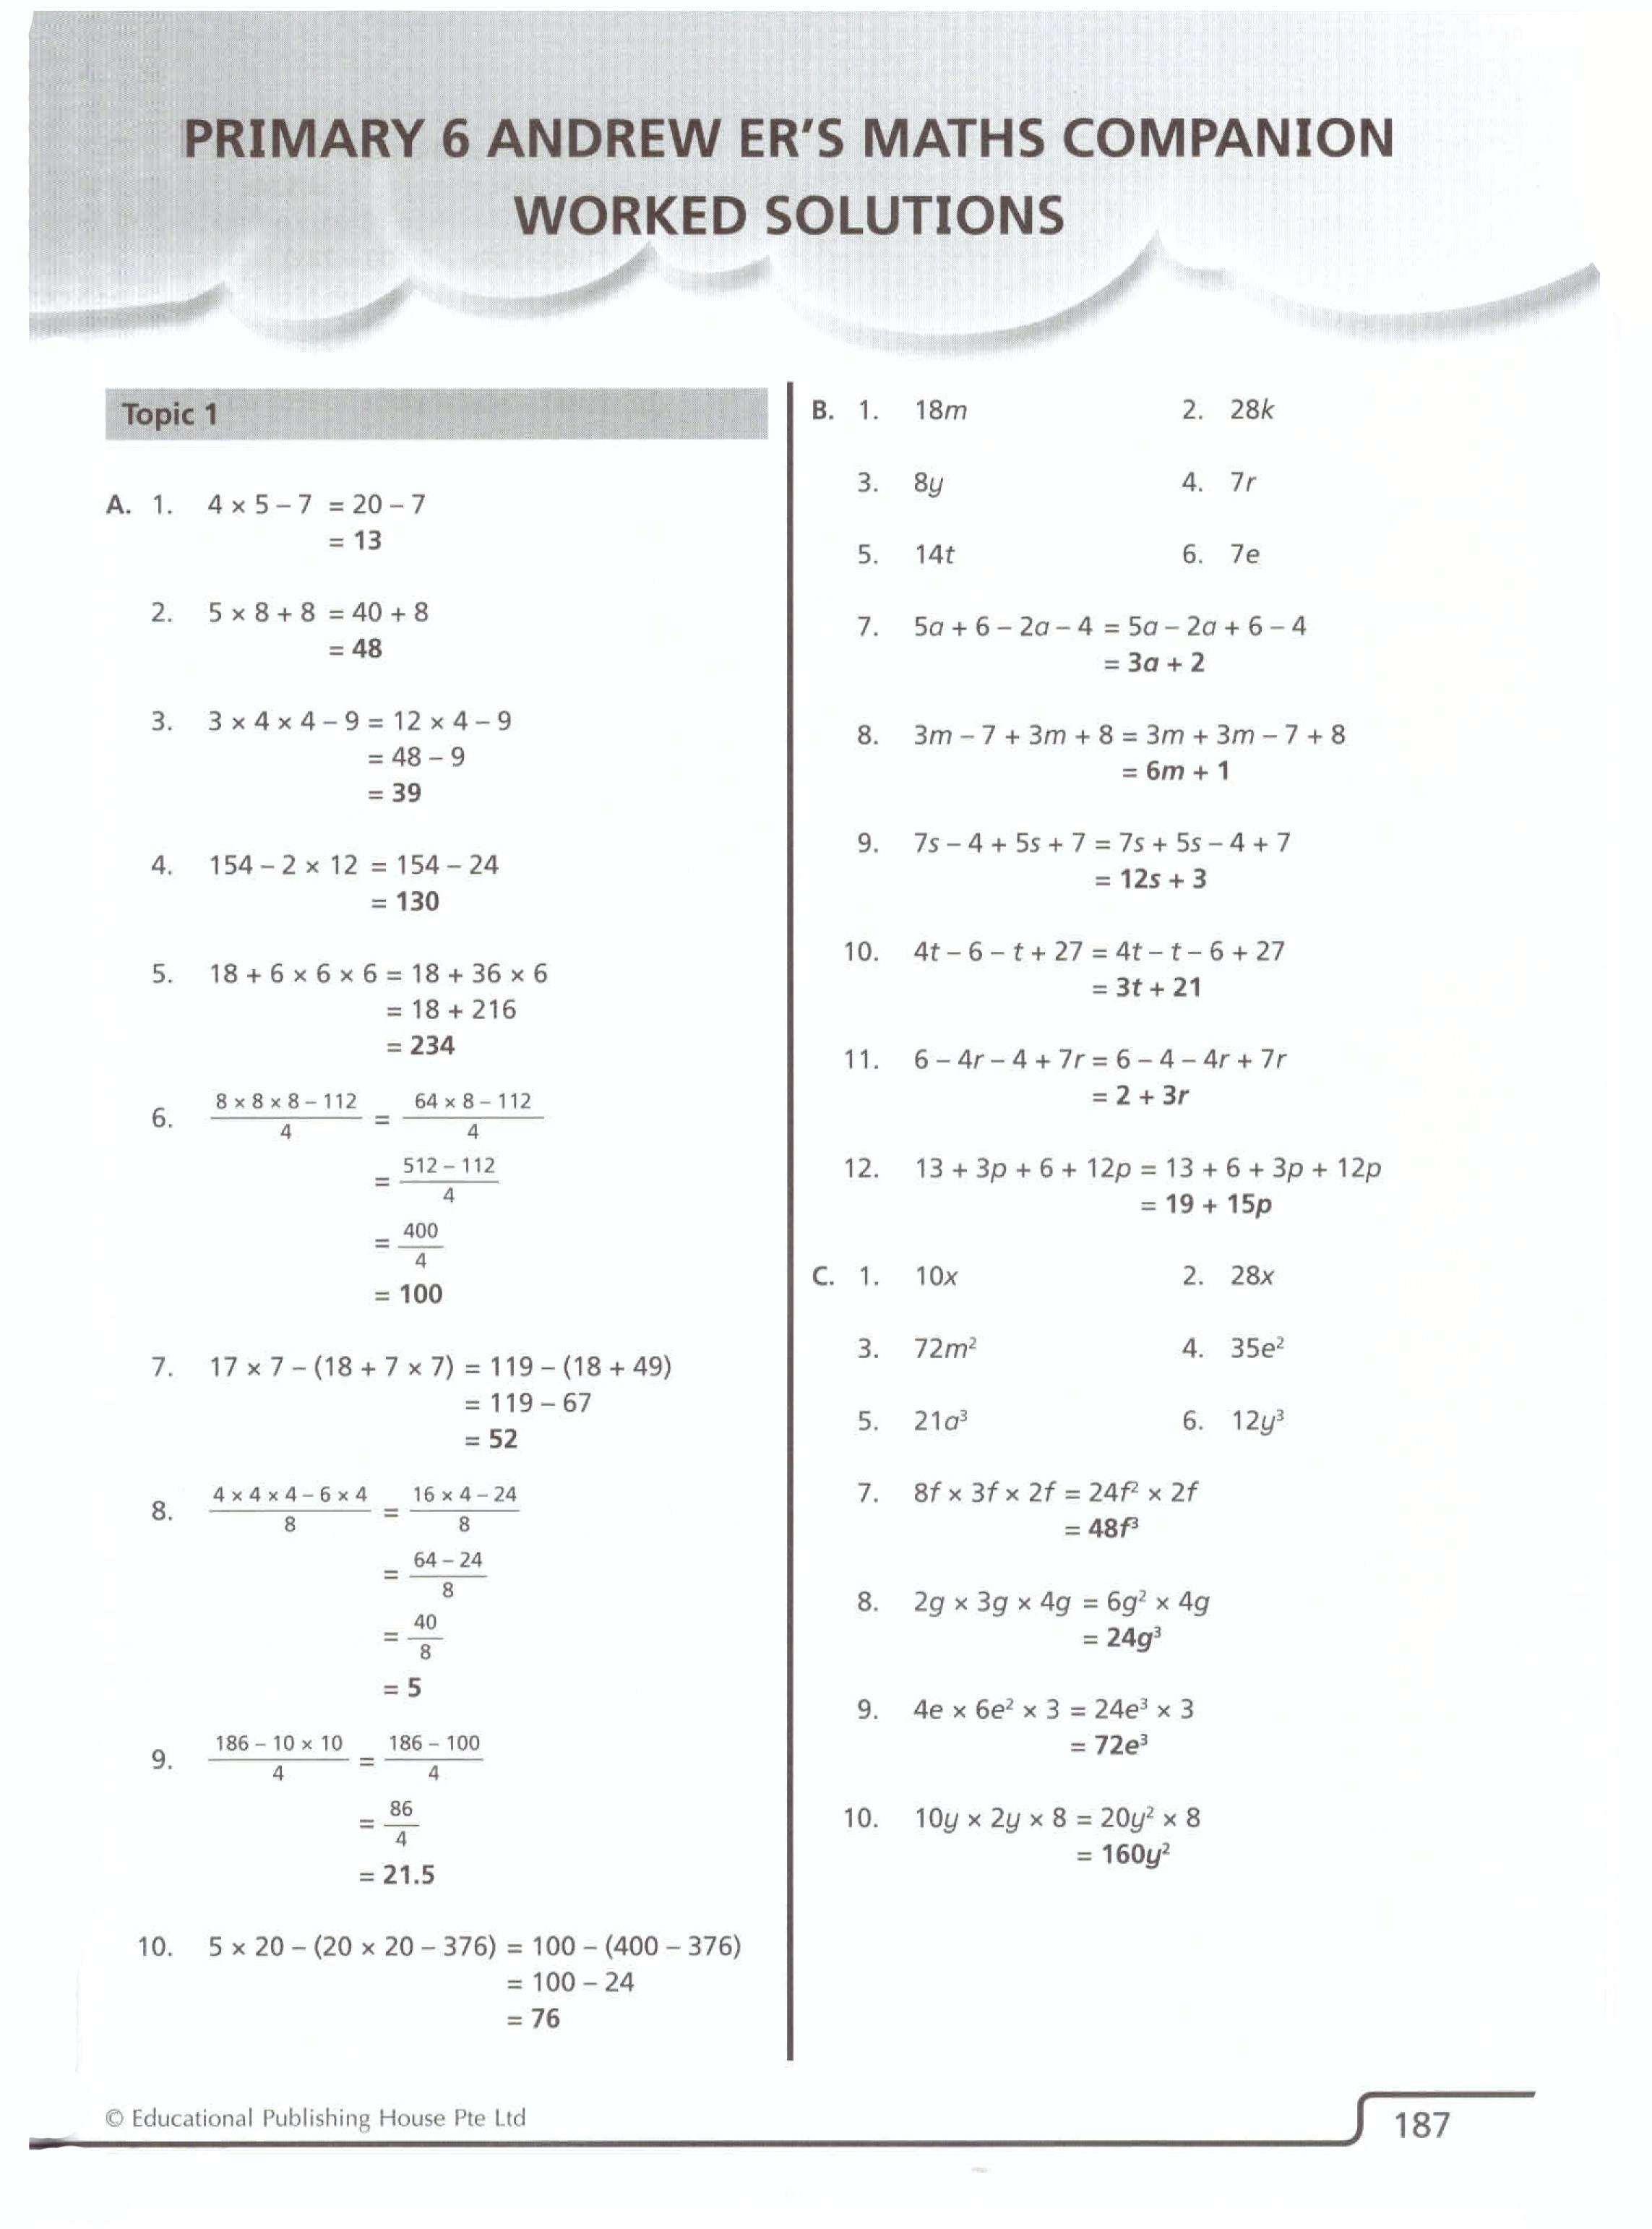 Andrew Er S Maths Companion 6 Openschoolbag [ 3084 x 2286 Pixel ]